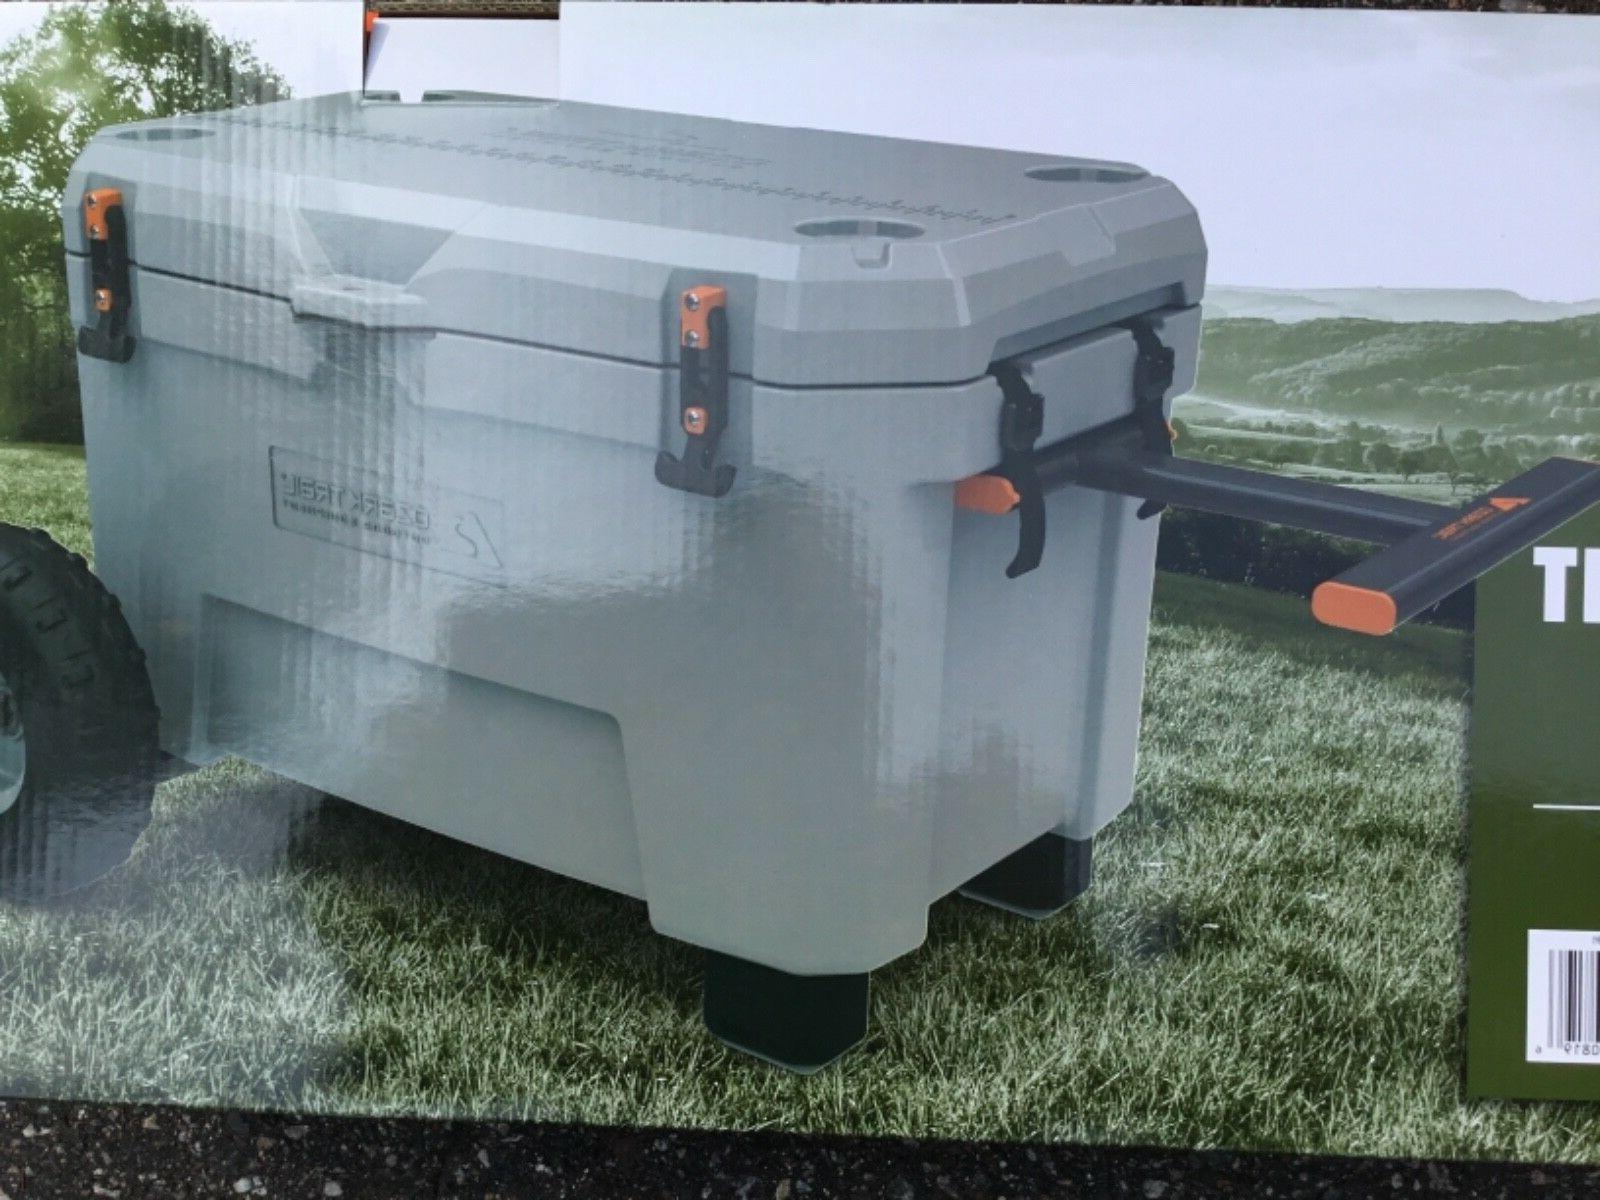 Ozark Trail High Performance Cooler Fits 52 Coolers